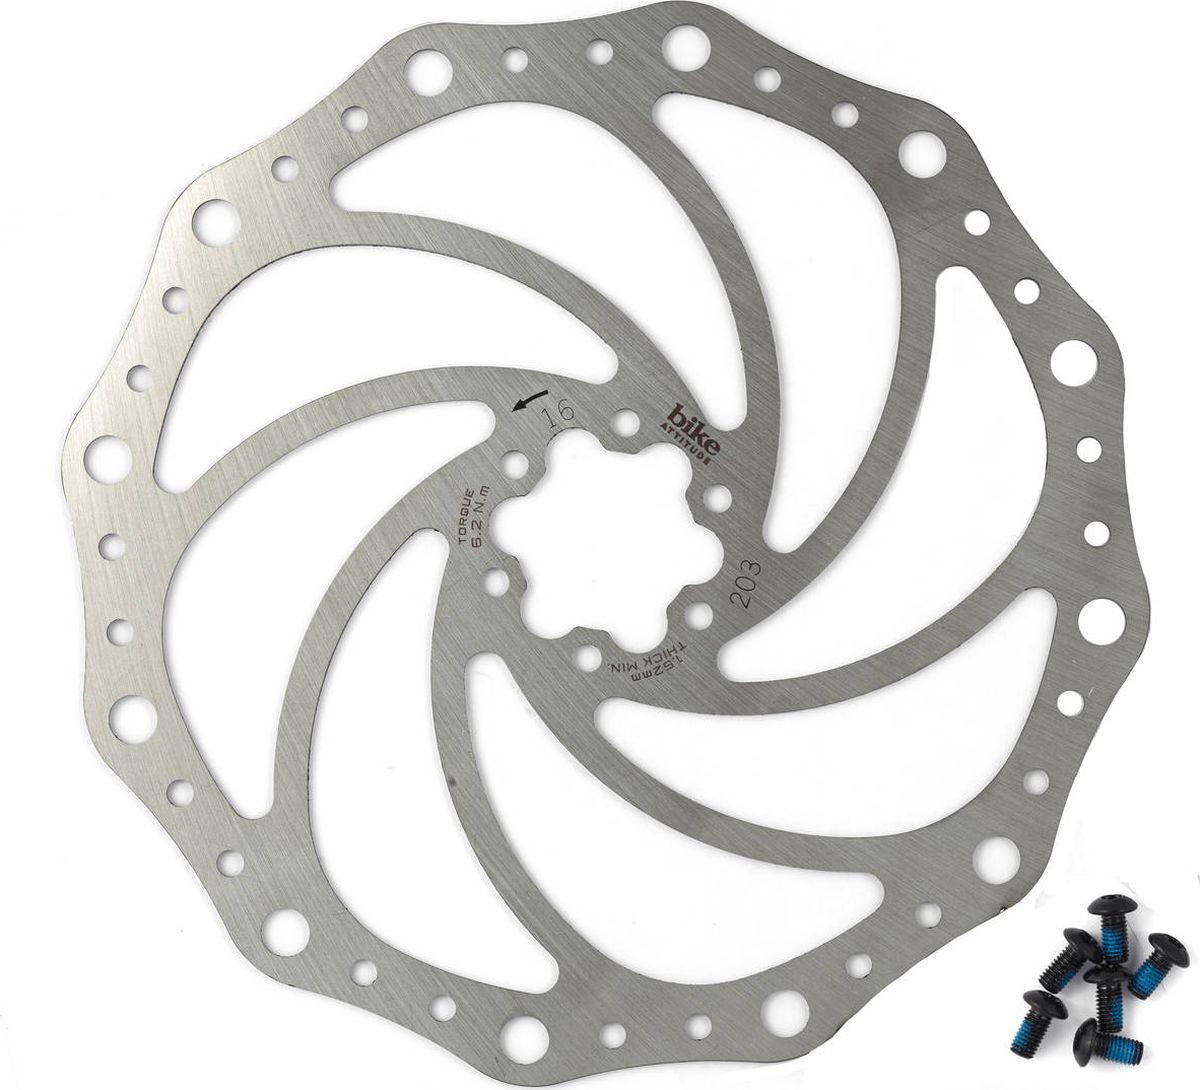 Тормозной диск Bike Attitude, YJ014, серебристый, 203 мм